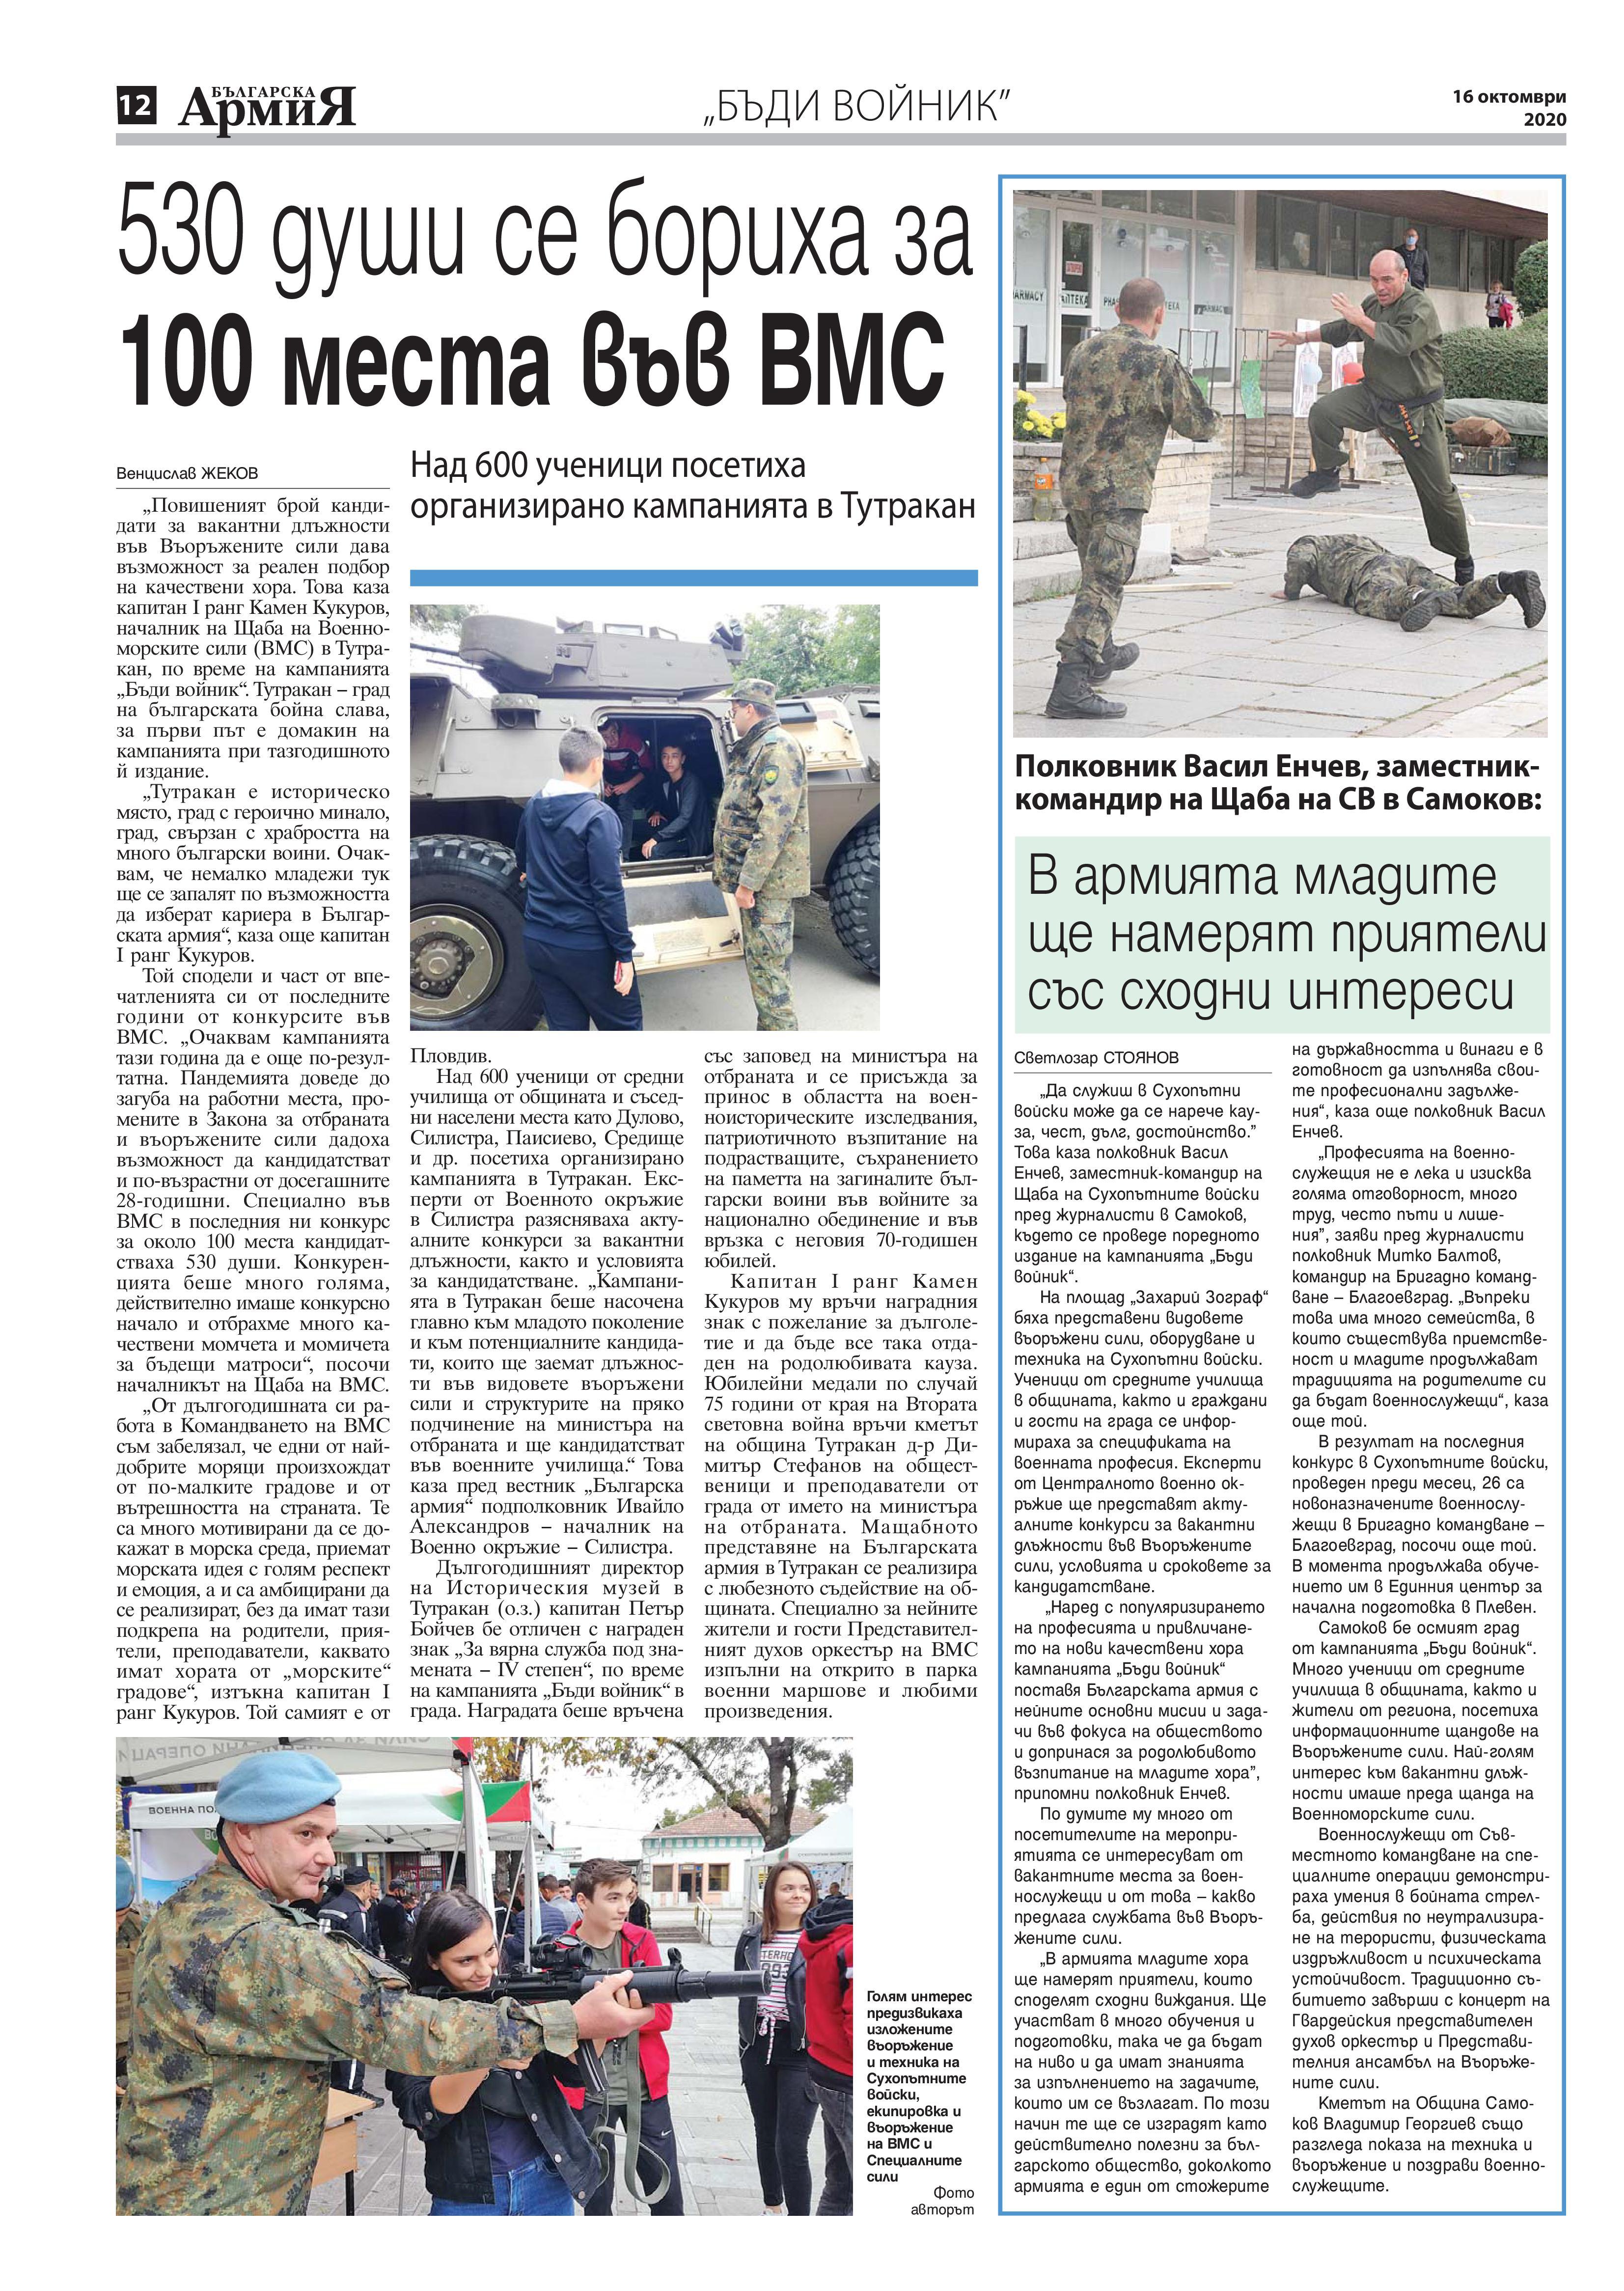 https://armymedia.bg/wp-content/uploads/2015/06/12-44.jpg